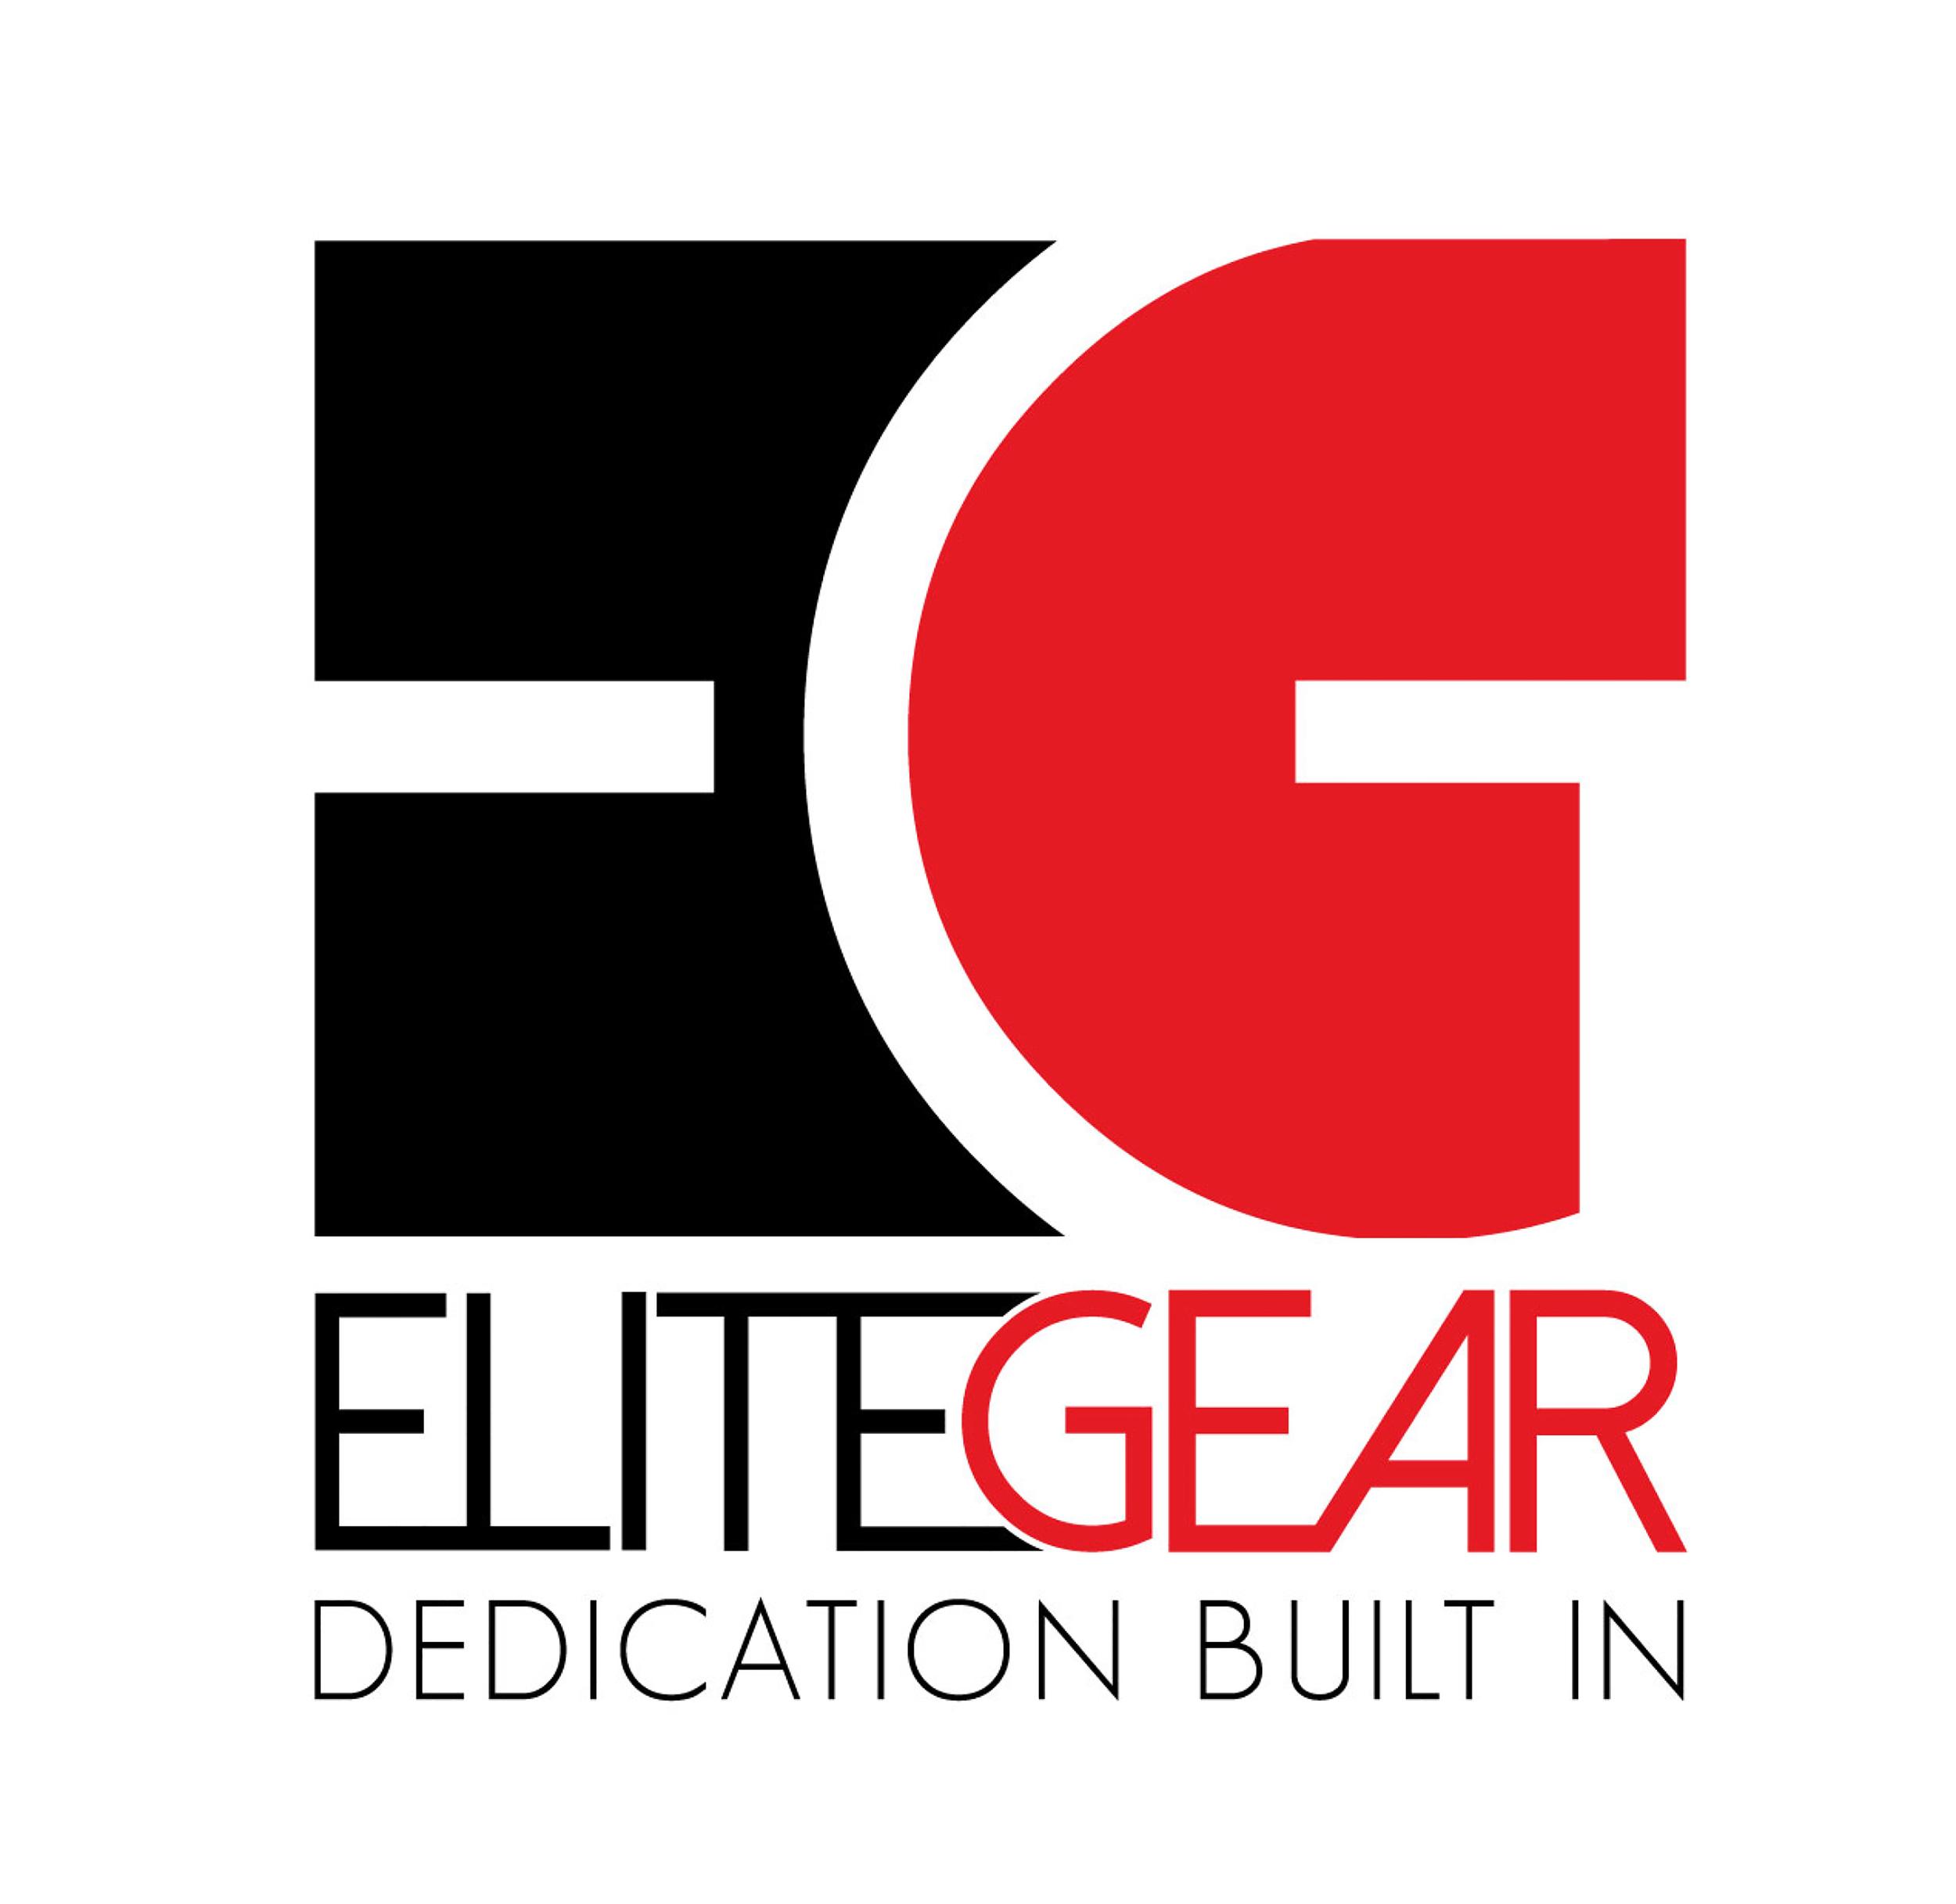 elite gear logo white background.jpg